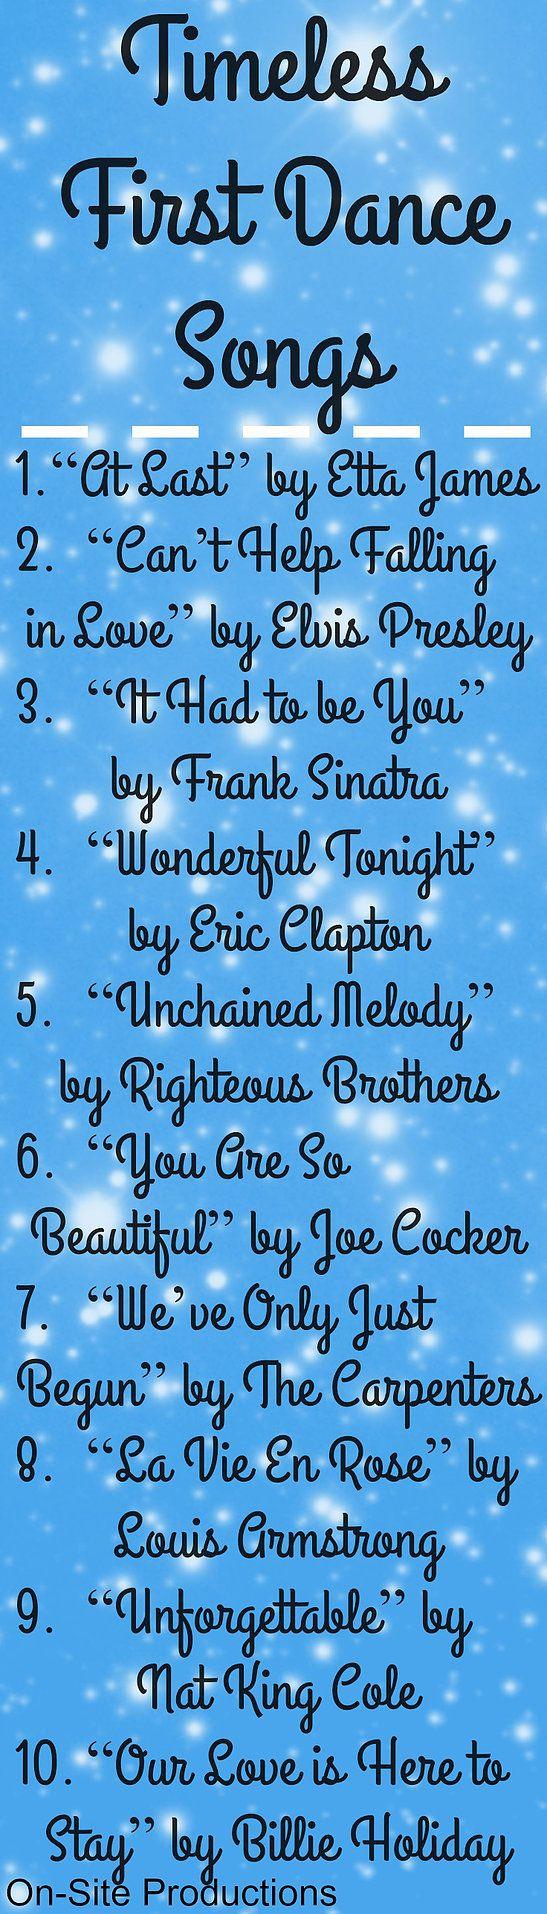 Best 25 Wedding Dance Songs Ideas On Pinterest